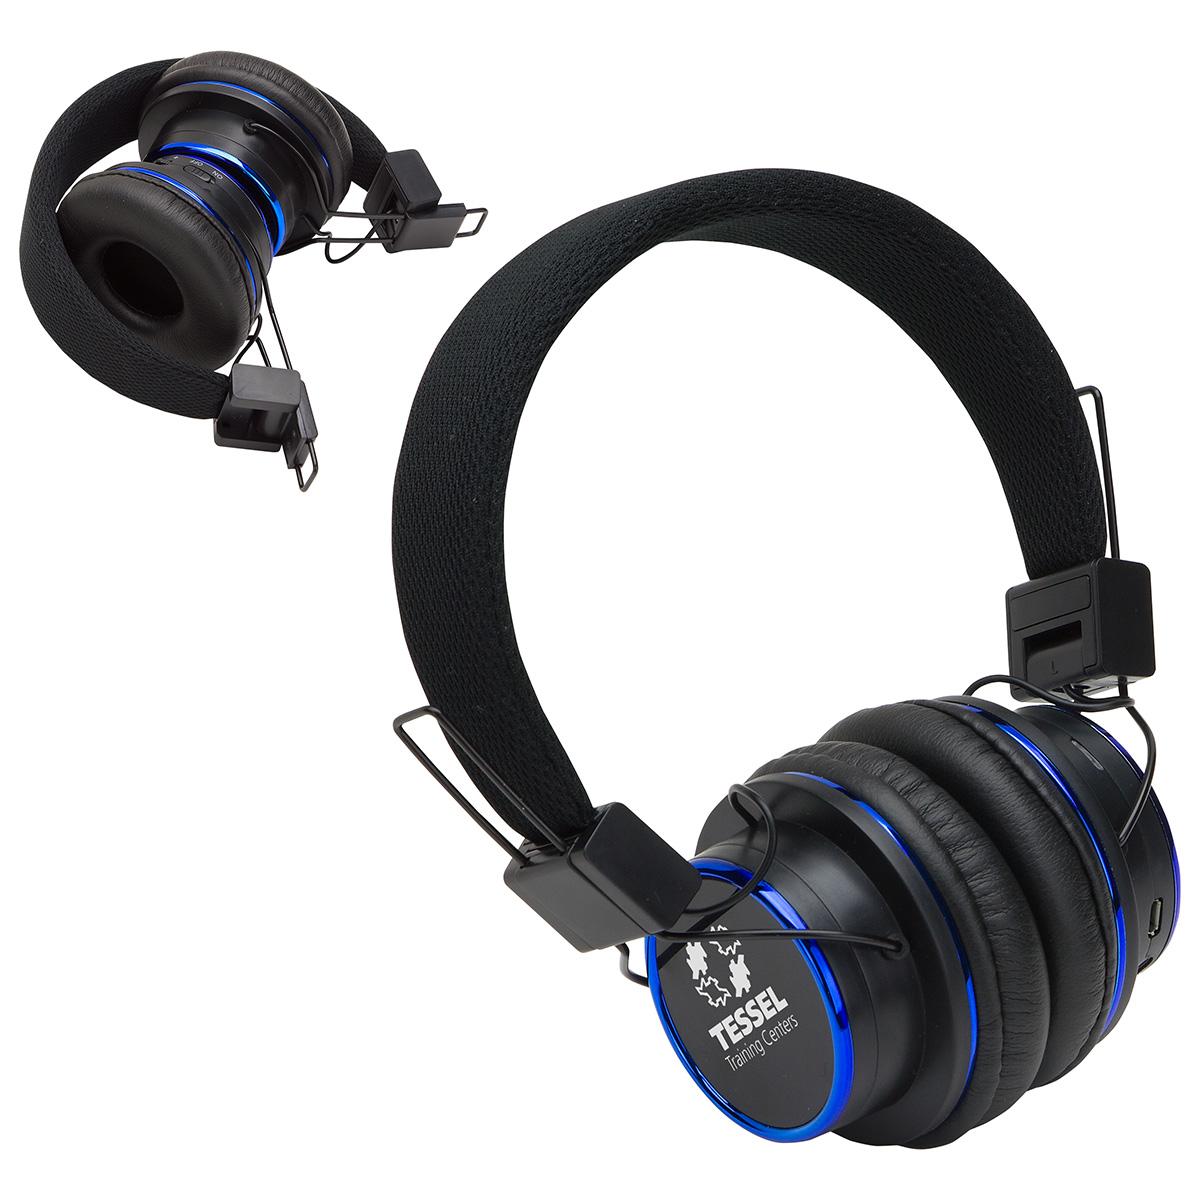 Top Sound Noise Cancellation Wireless Folding Headphones, ETV-TS17 - 1 Colour Imprint